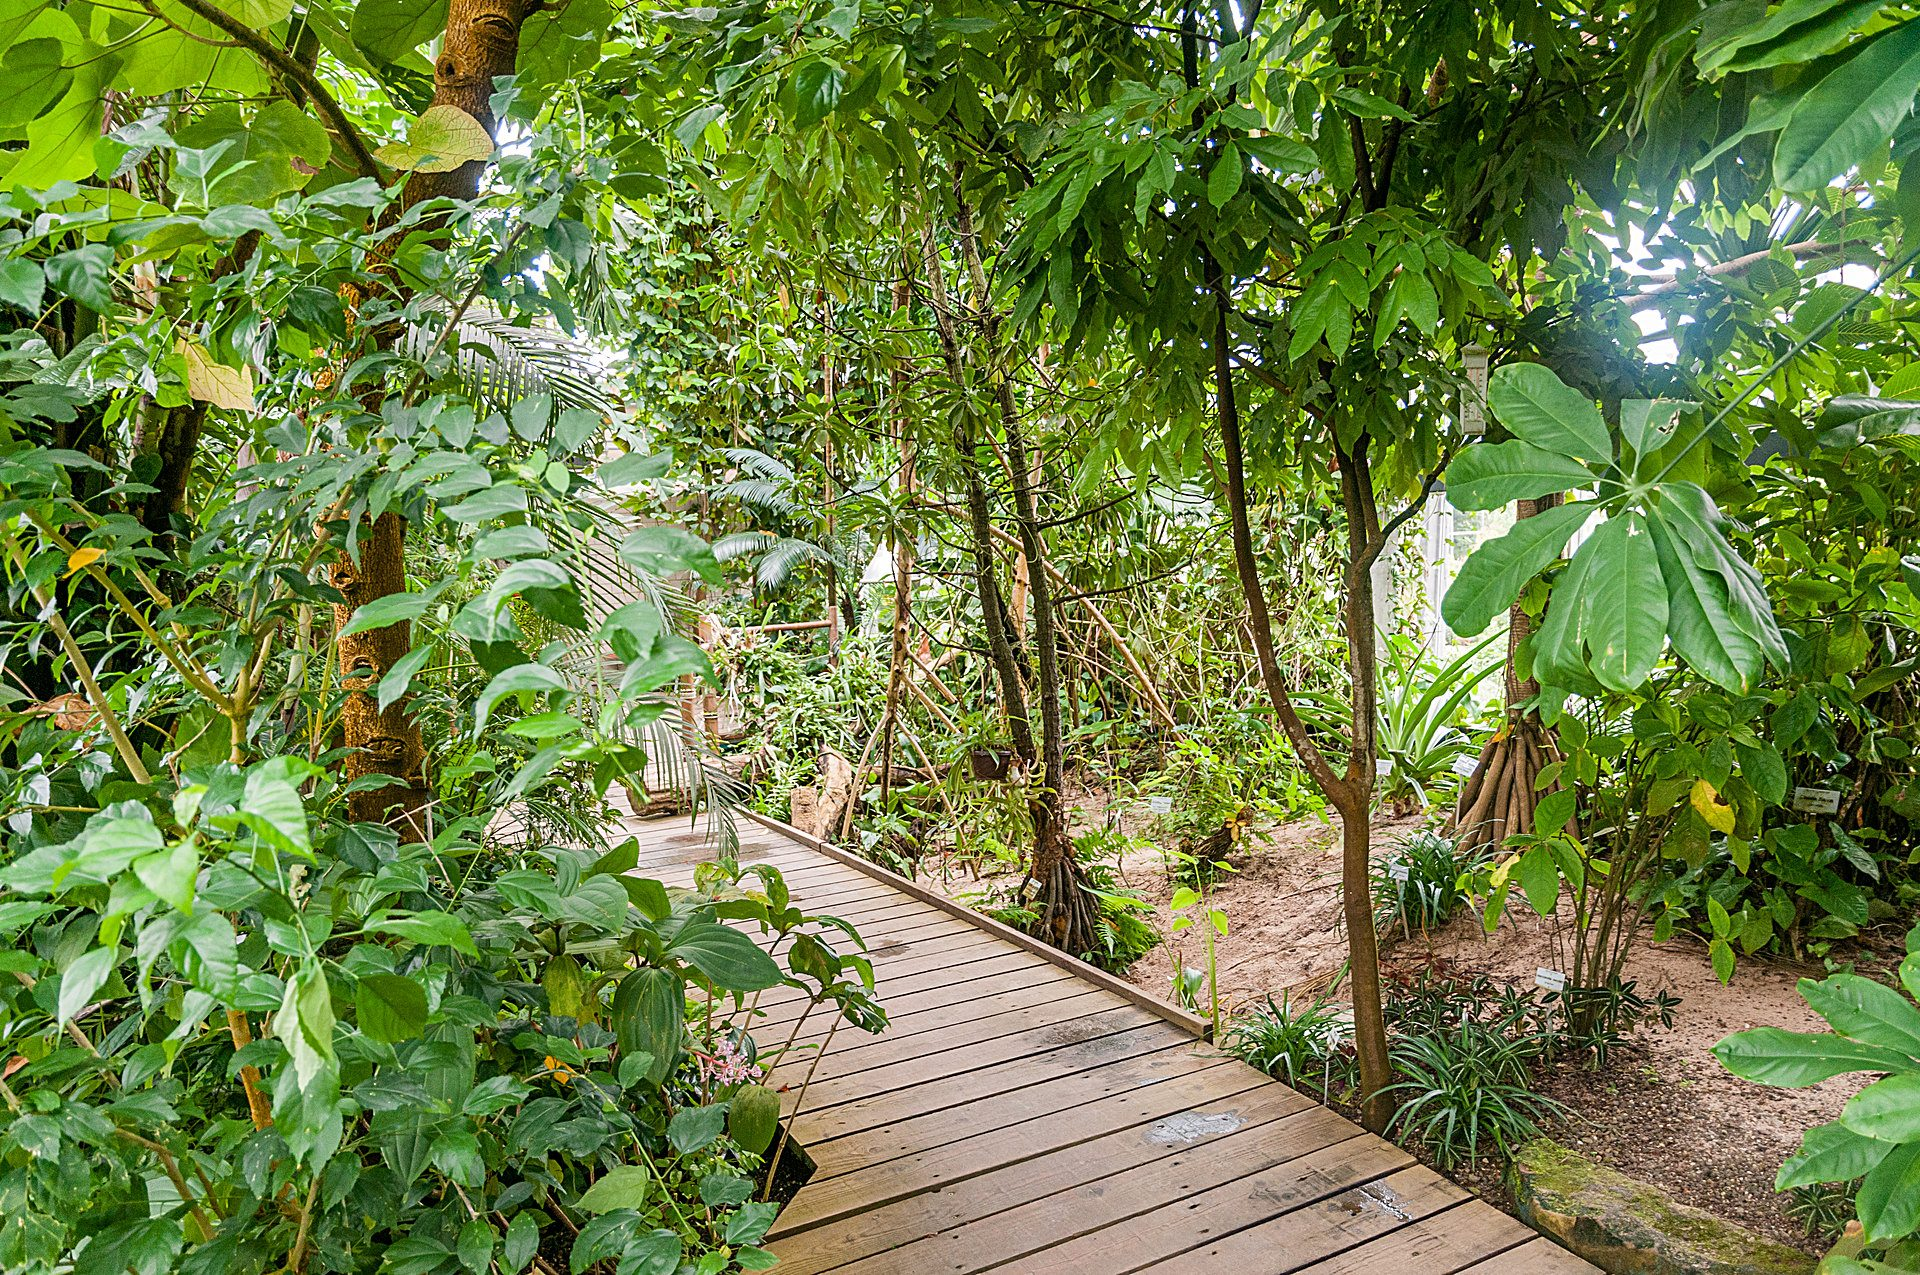 Botanischer garten w rzburg tropenschauhaus - Garten fotos ...